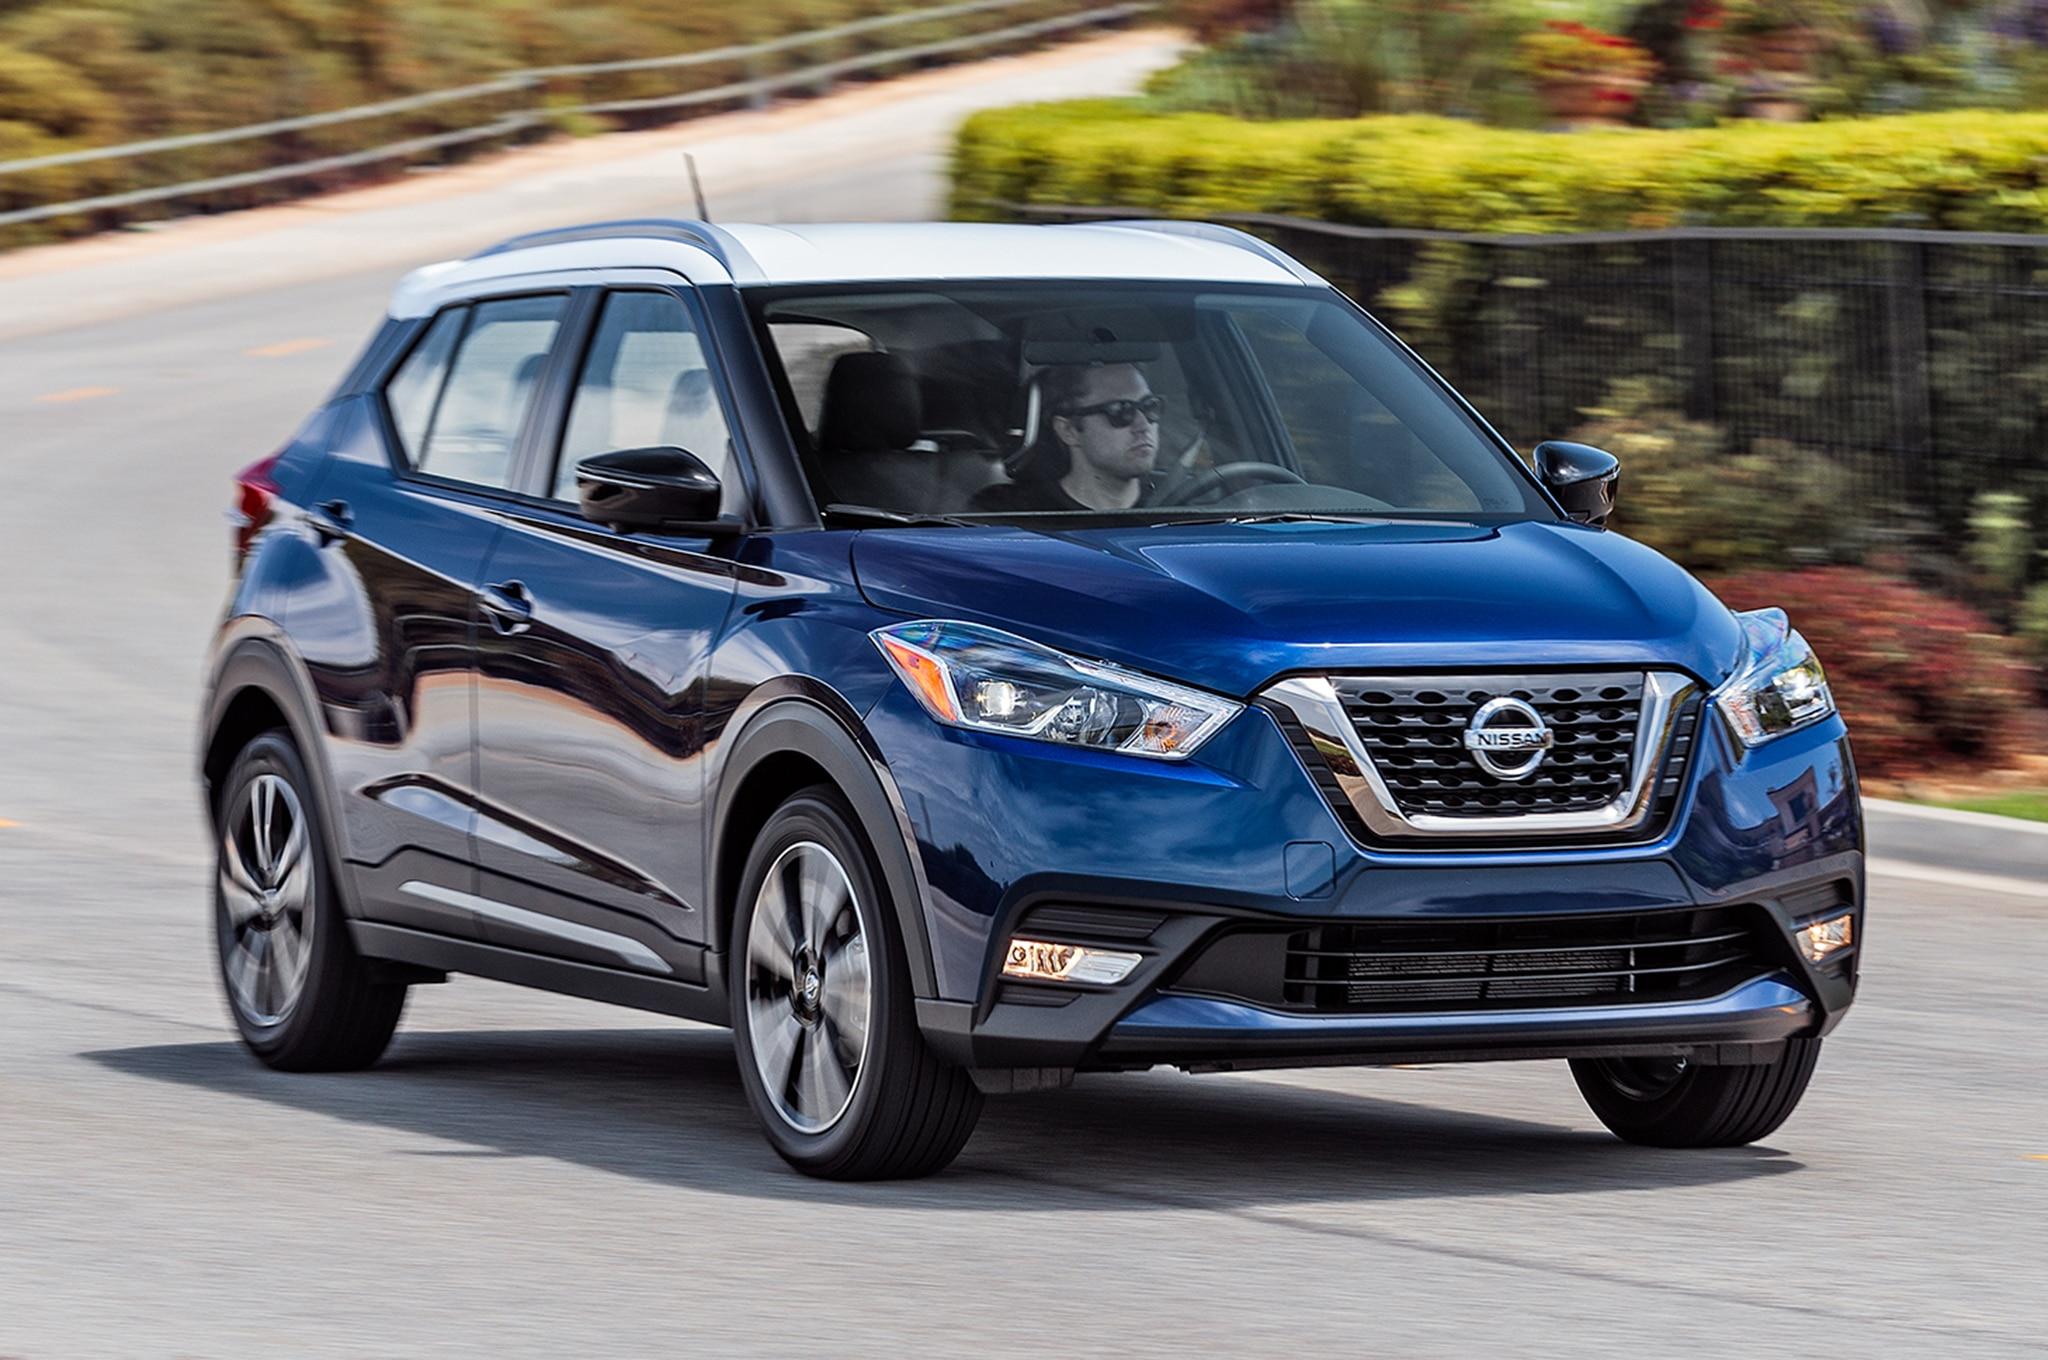 2018 Nissan Kicks SR Front Three Quarter In Motion 04